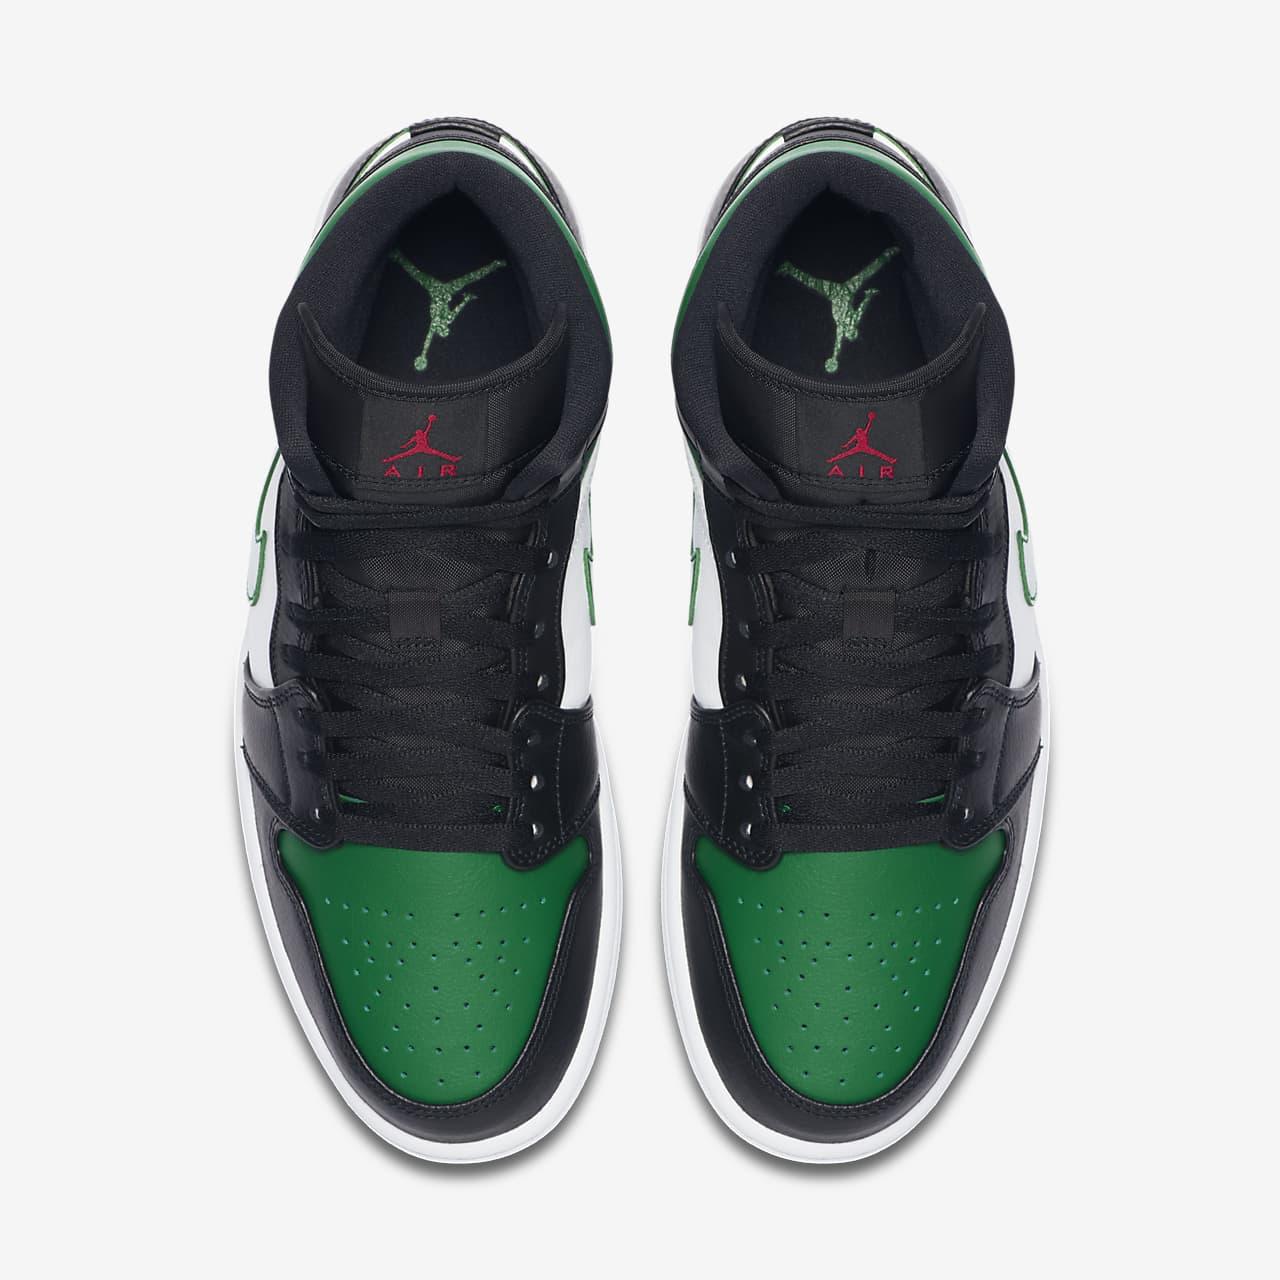 sneakers nike air jordan 1 mid